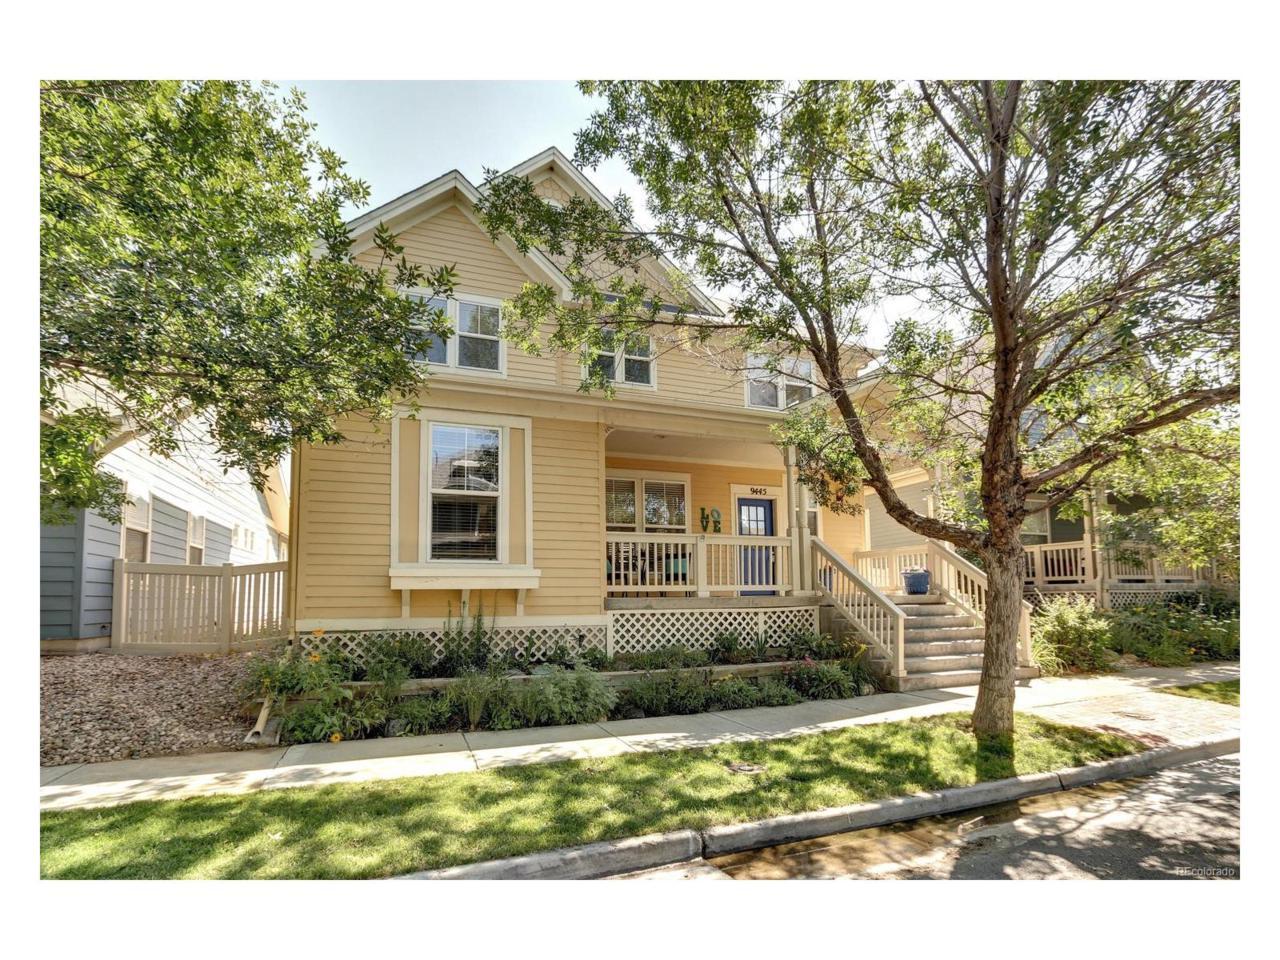 9445 E 106th Place, Henderson, CO 80640 (MLS #3095880) :: 8z Real Estate